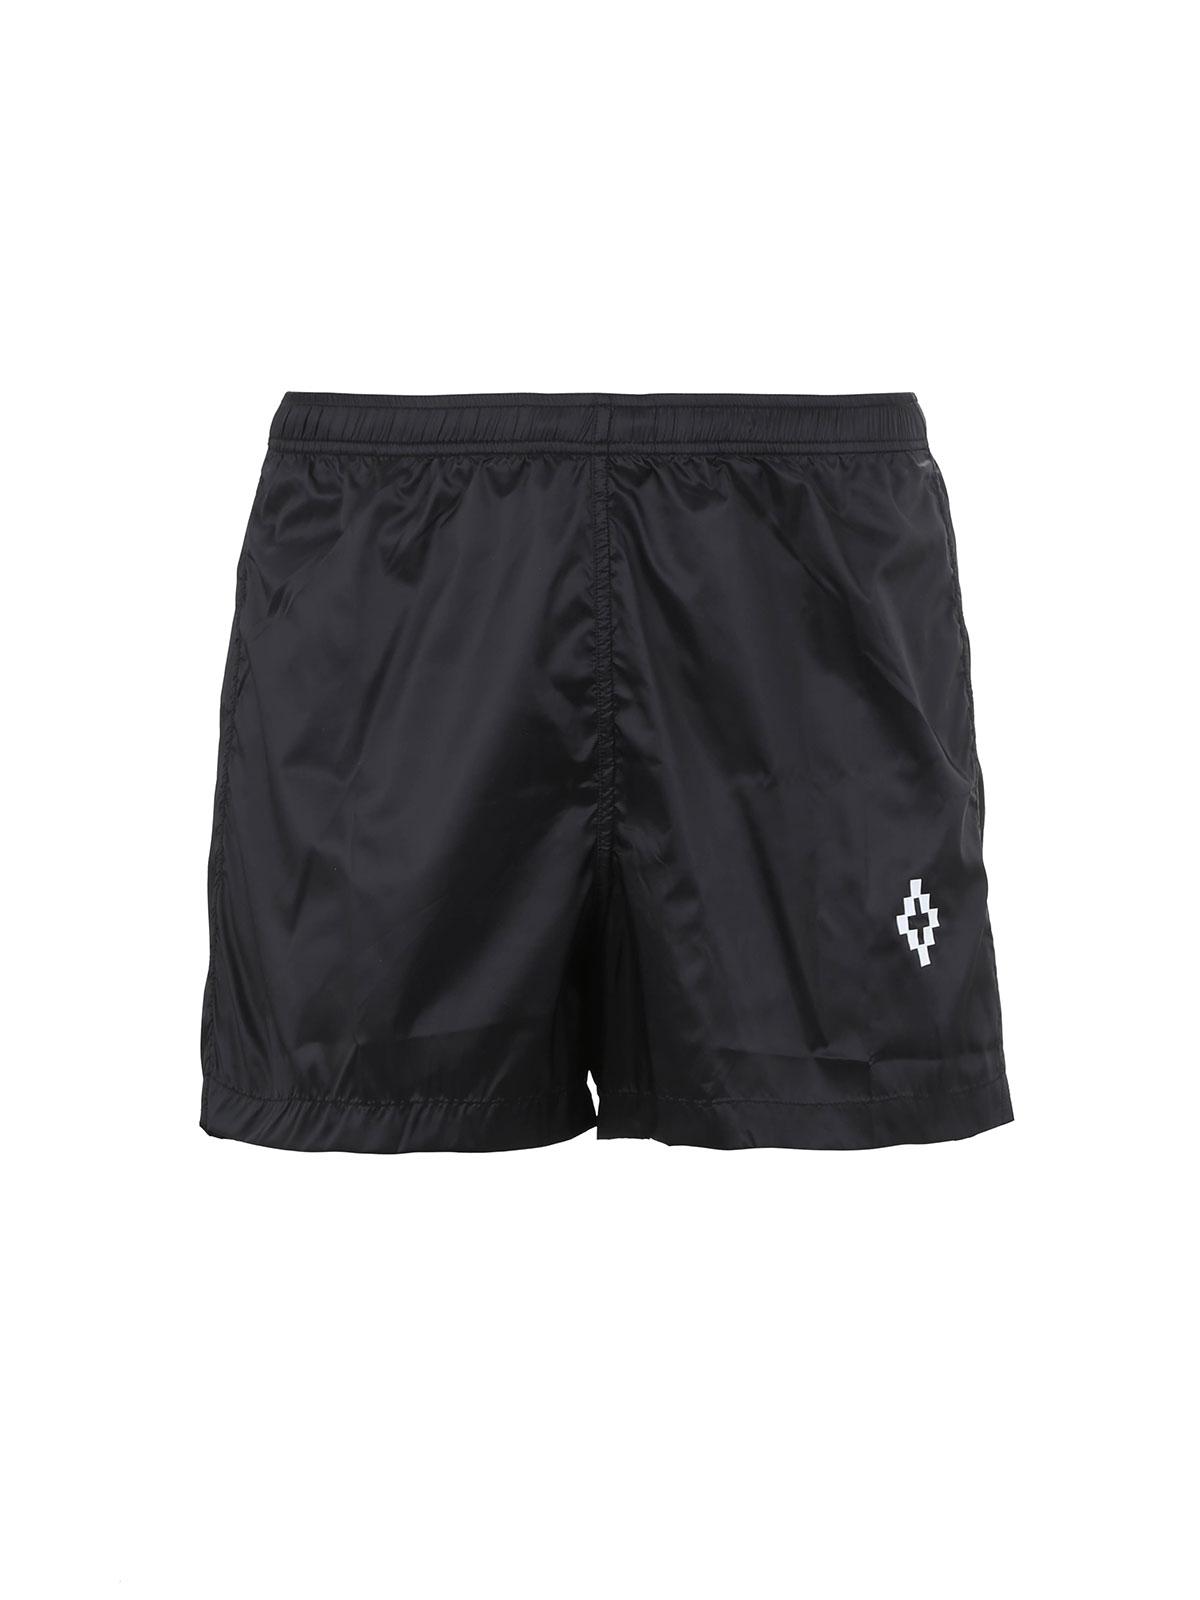 20765a2ebf Marcelo Burlon: Swim shorts & swimming trunks - Jatibonico swim shorts